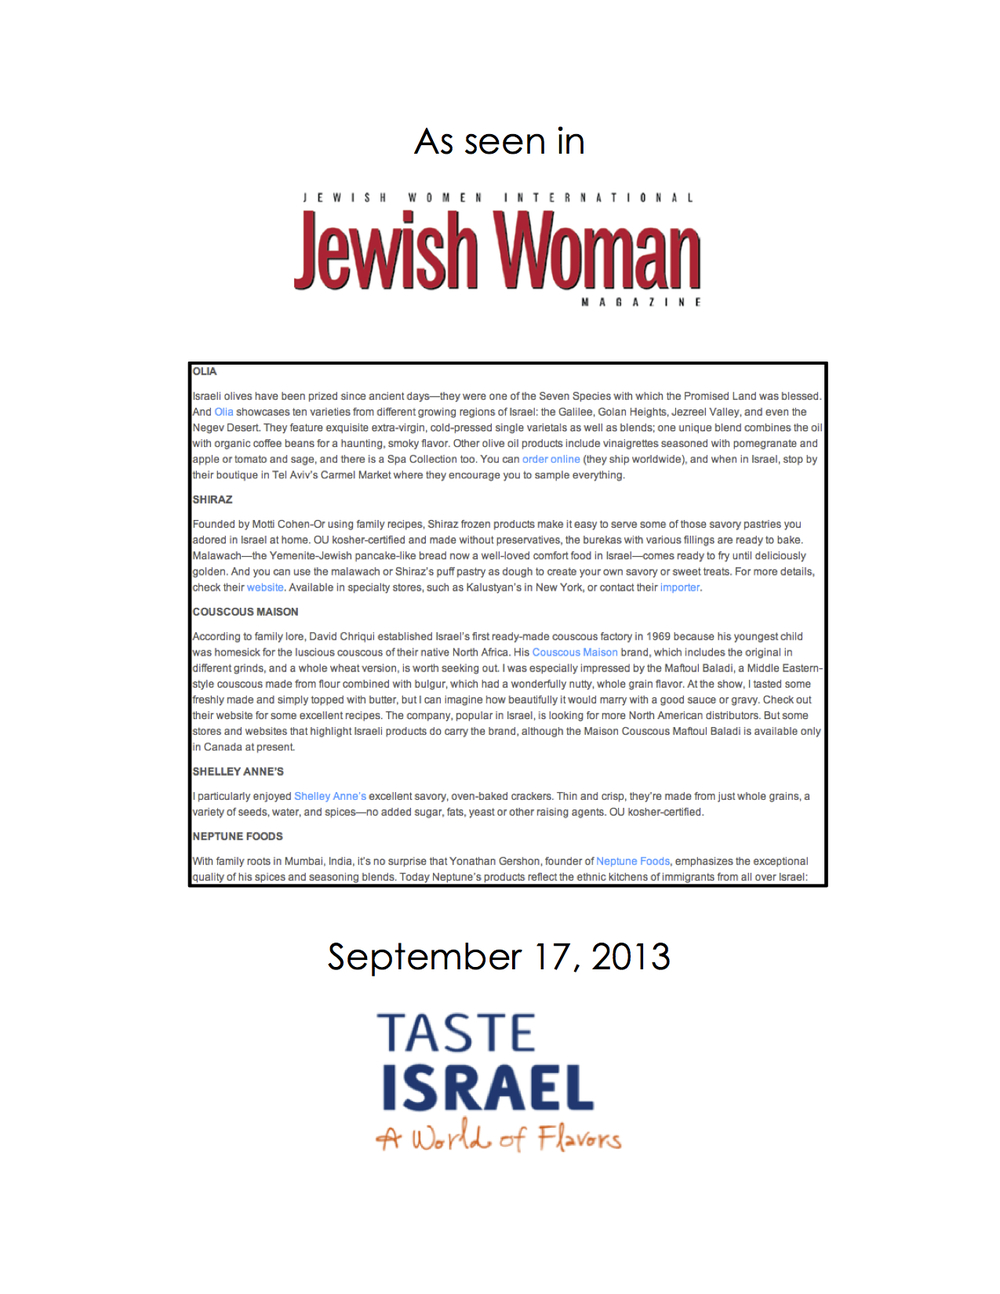 Israel-As seen in- Jewish Woman copy.jpg